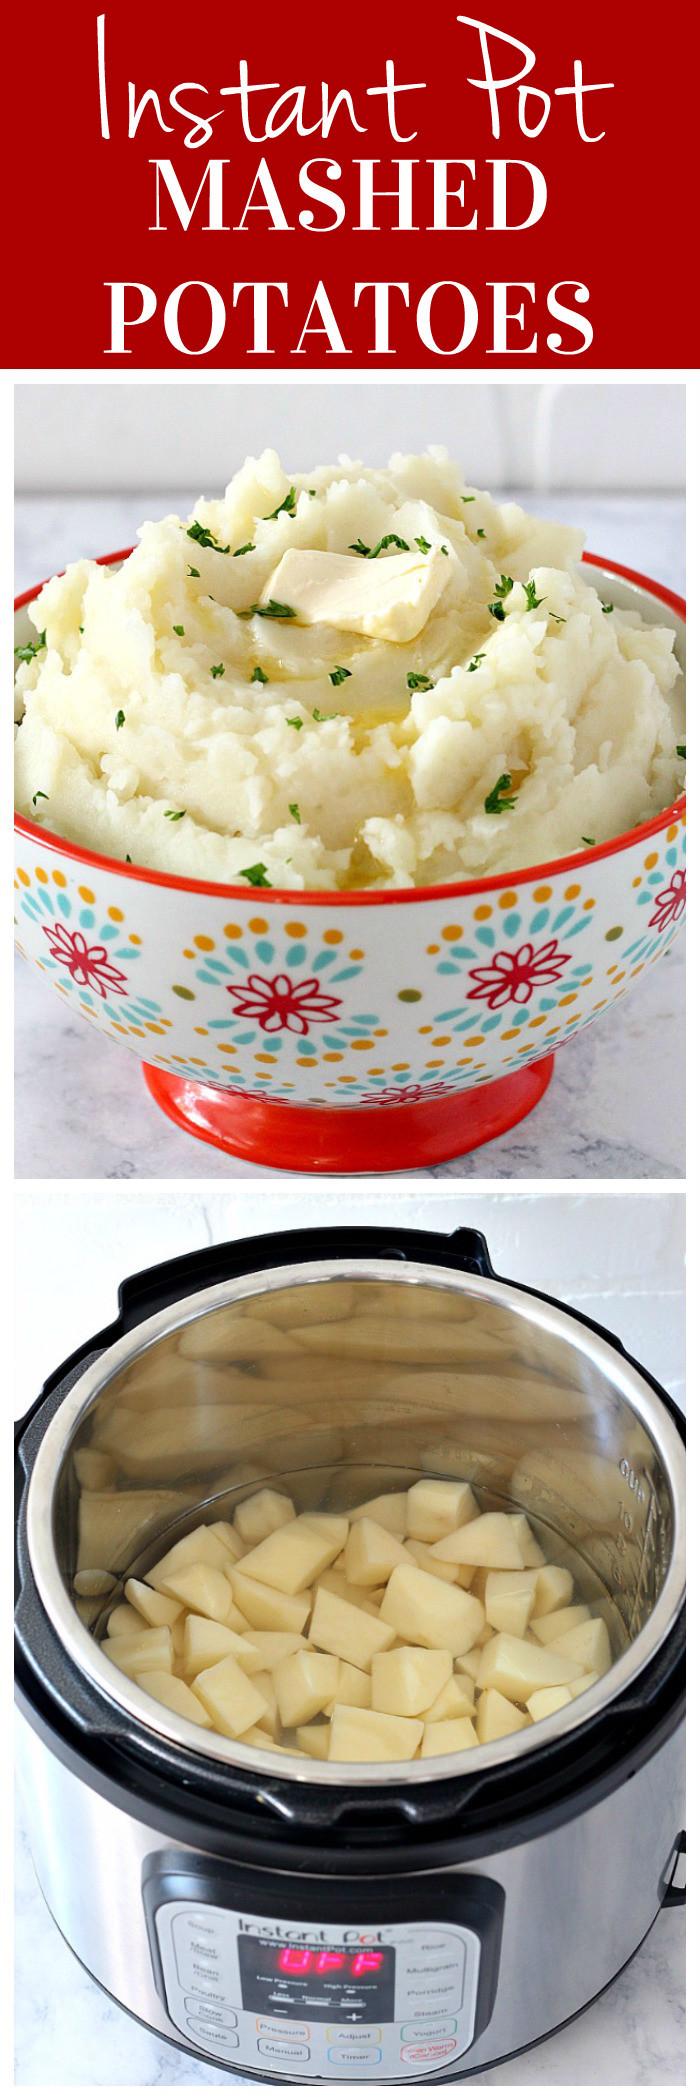 Instant Pot Potato Recipes  Instant Pot Mashed Potatoes Recipe Crunchy Creamy Sweet